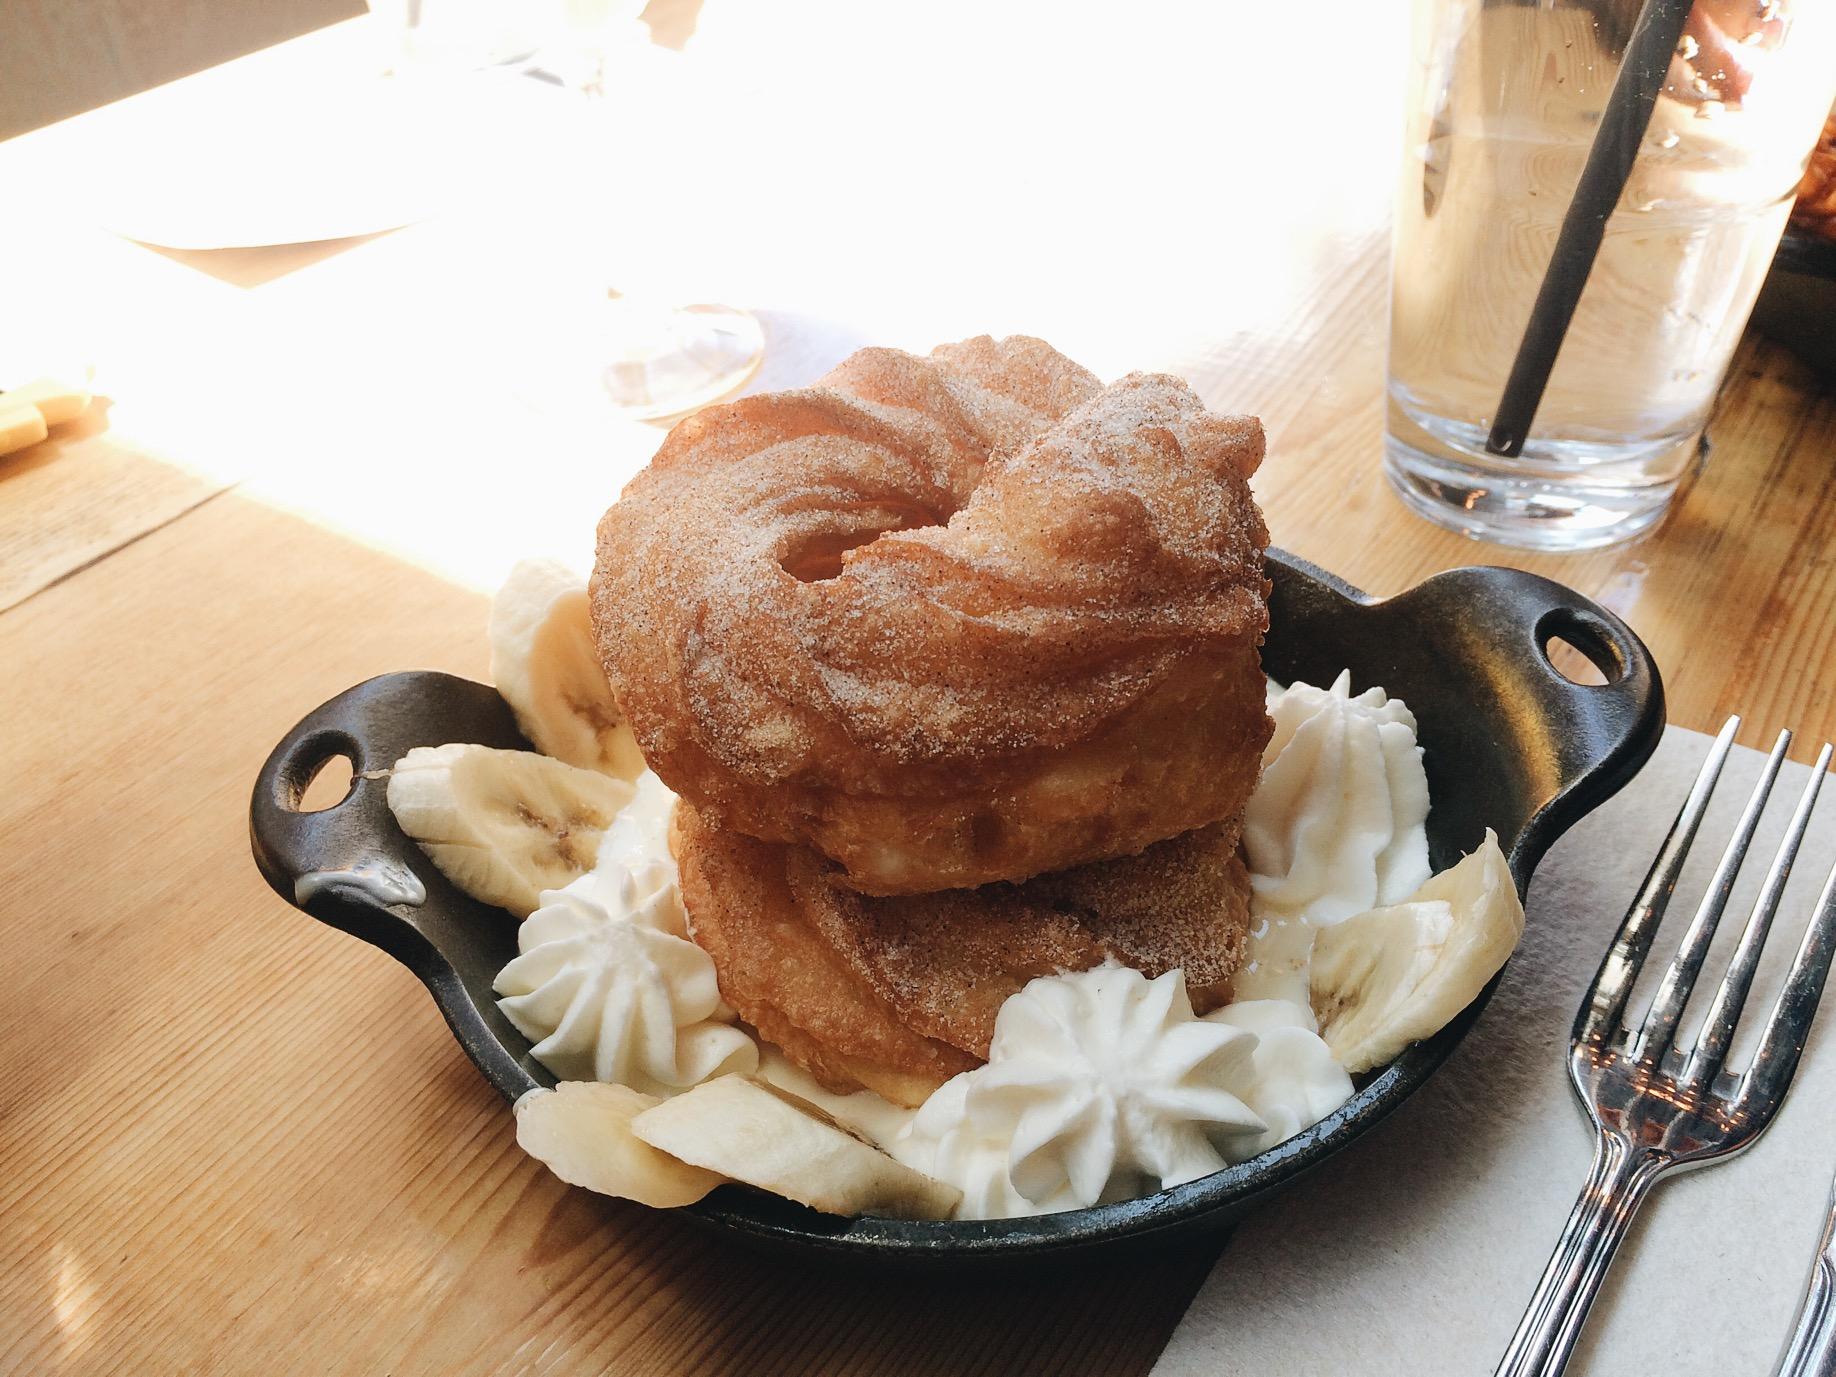 Kristina idea of a meal, Cruller Donut for brunch.